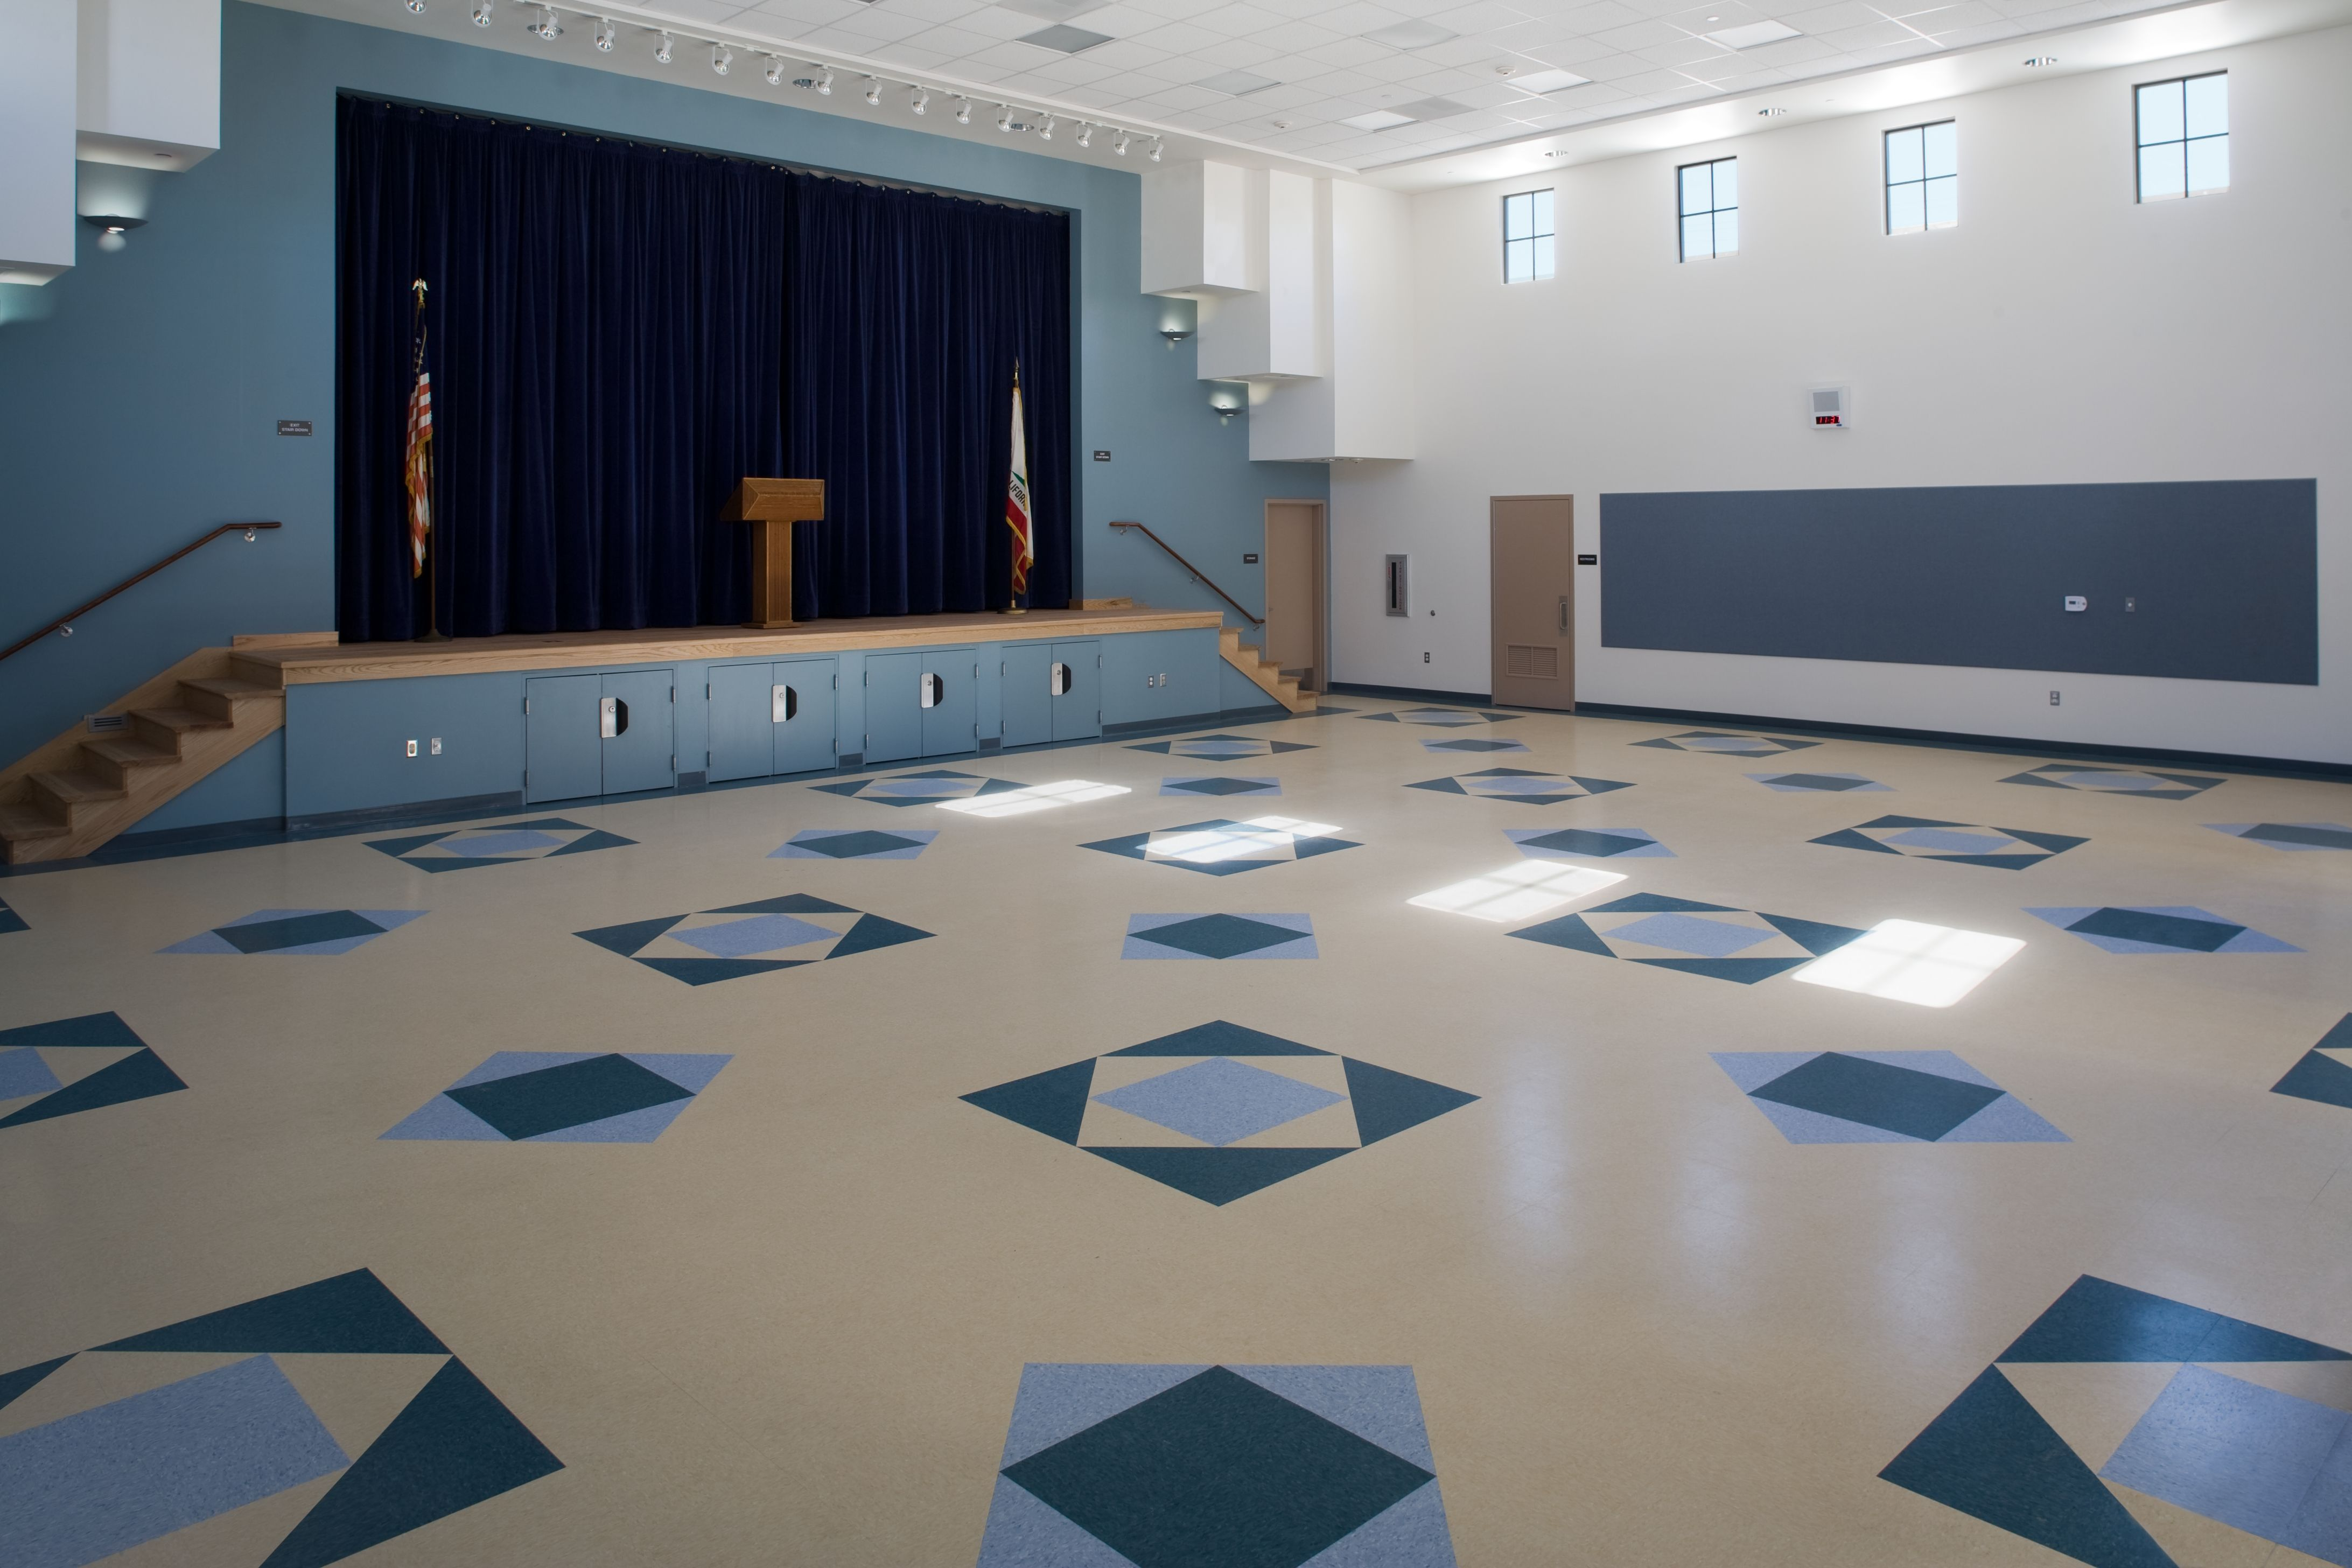 Cabrillo Elementary School Multipurpose Room K 12